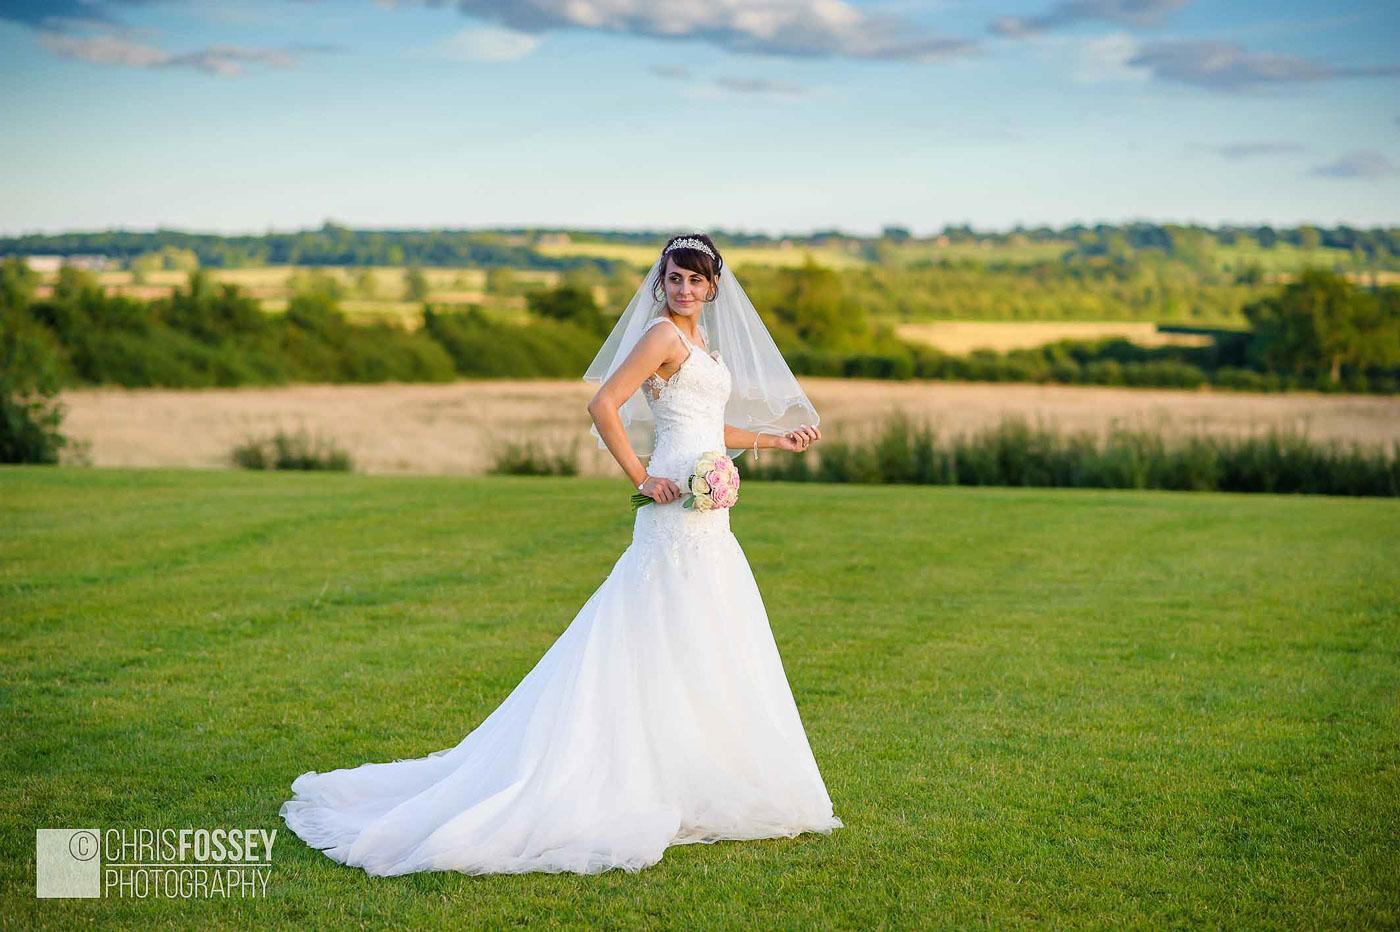 Wedding Photographer Clifton upon Dunsmore Rainsbrook Conference Centre Northamptonshire